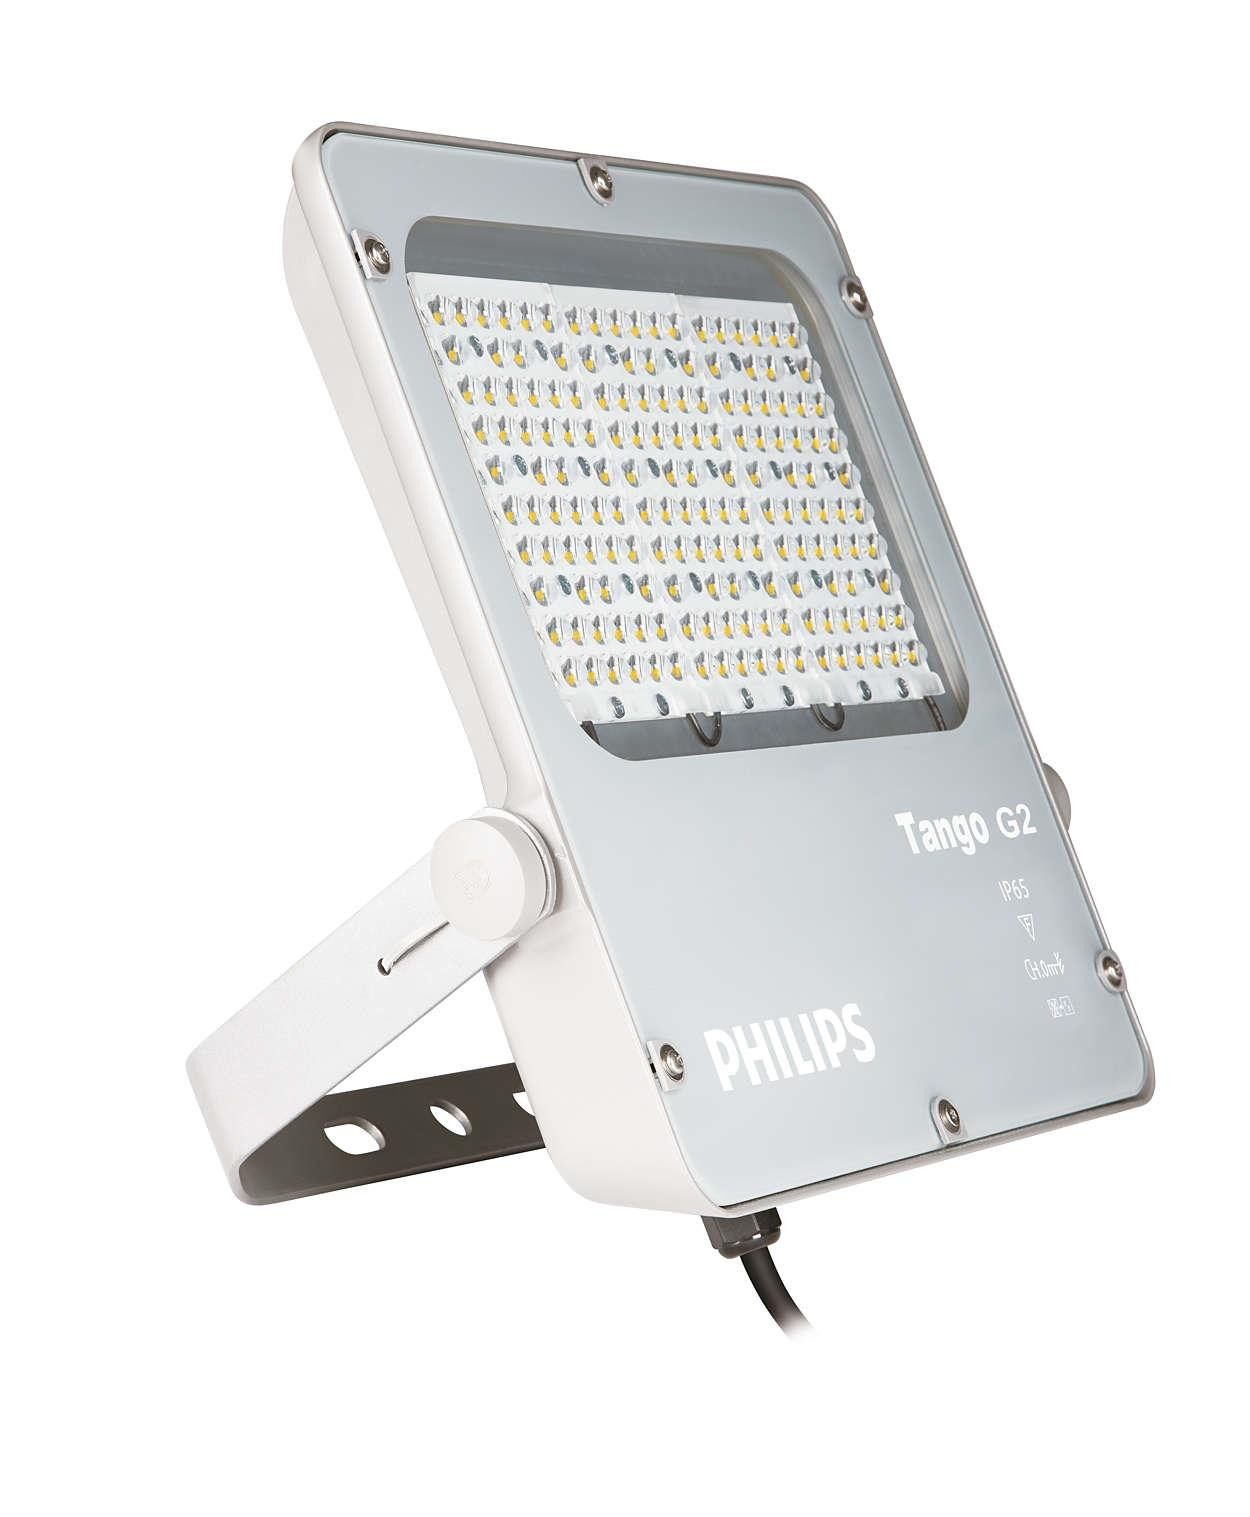 Jual Lampu Sorot LED / Flood Light Philips BVP281 -120W AC